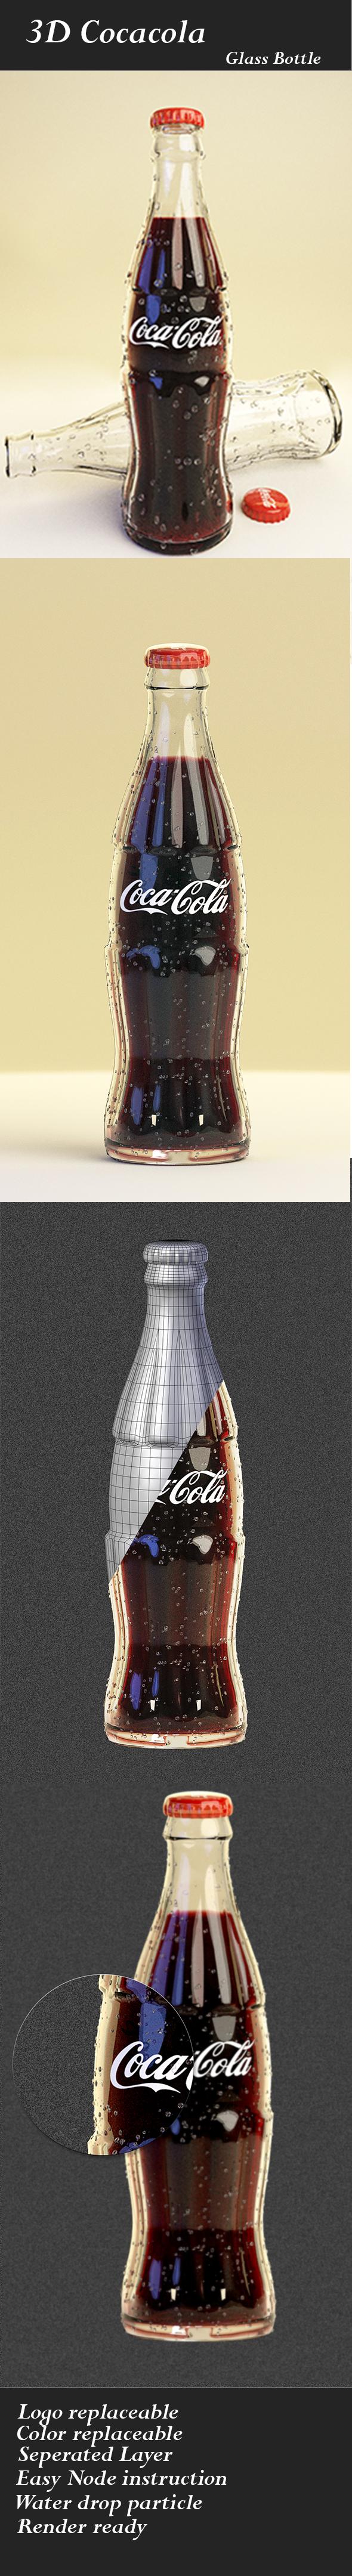 3D Cocacola Glass Bottle - 3DOcean Item for Sale